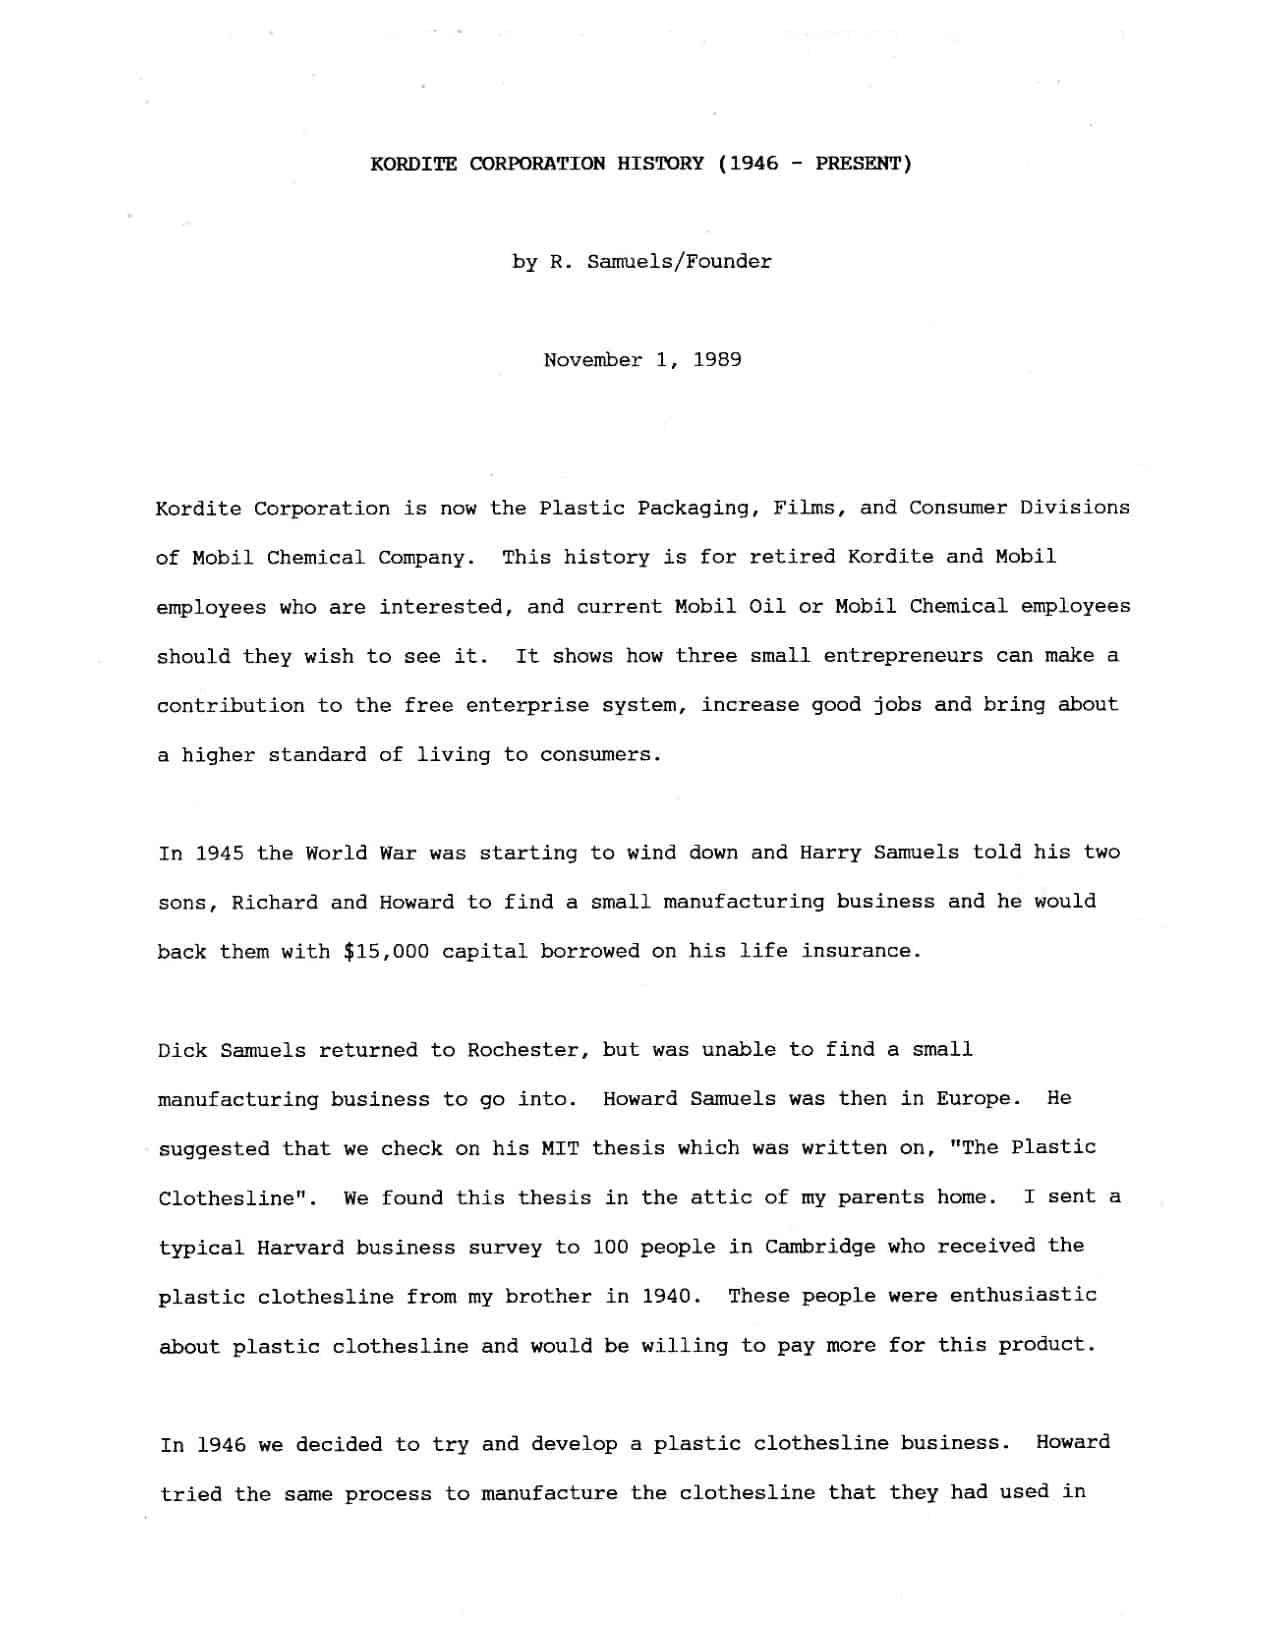 Kordite Corporation History (1946 - 1989) page 1